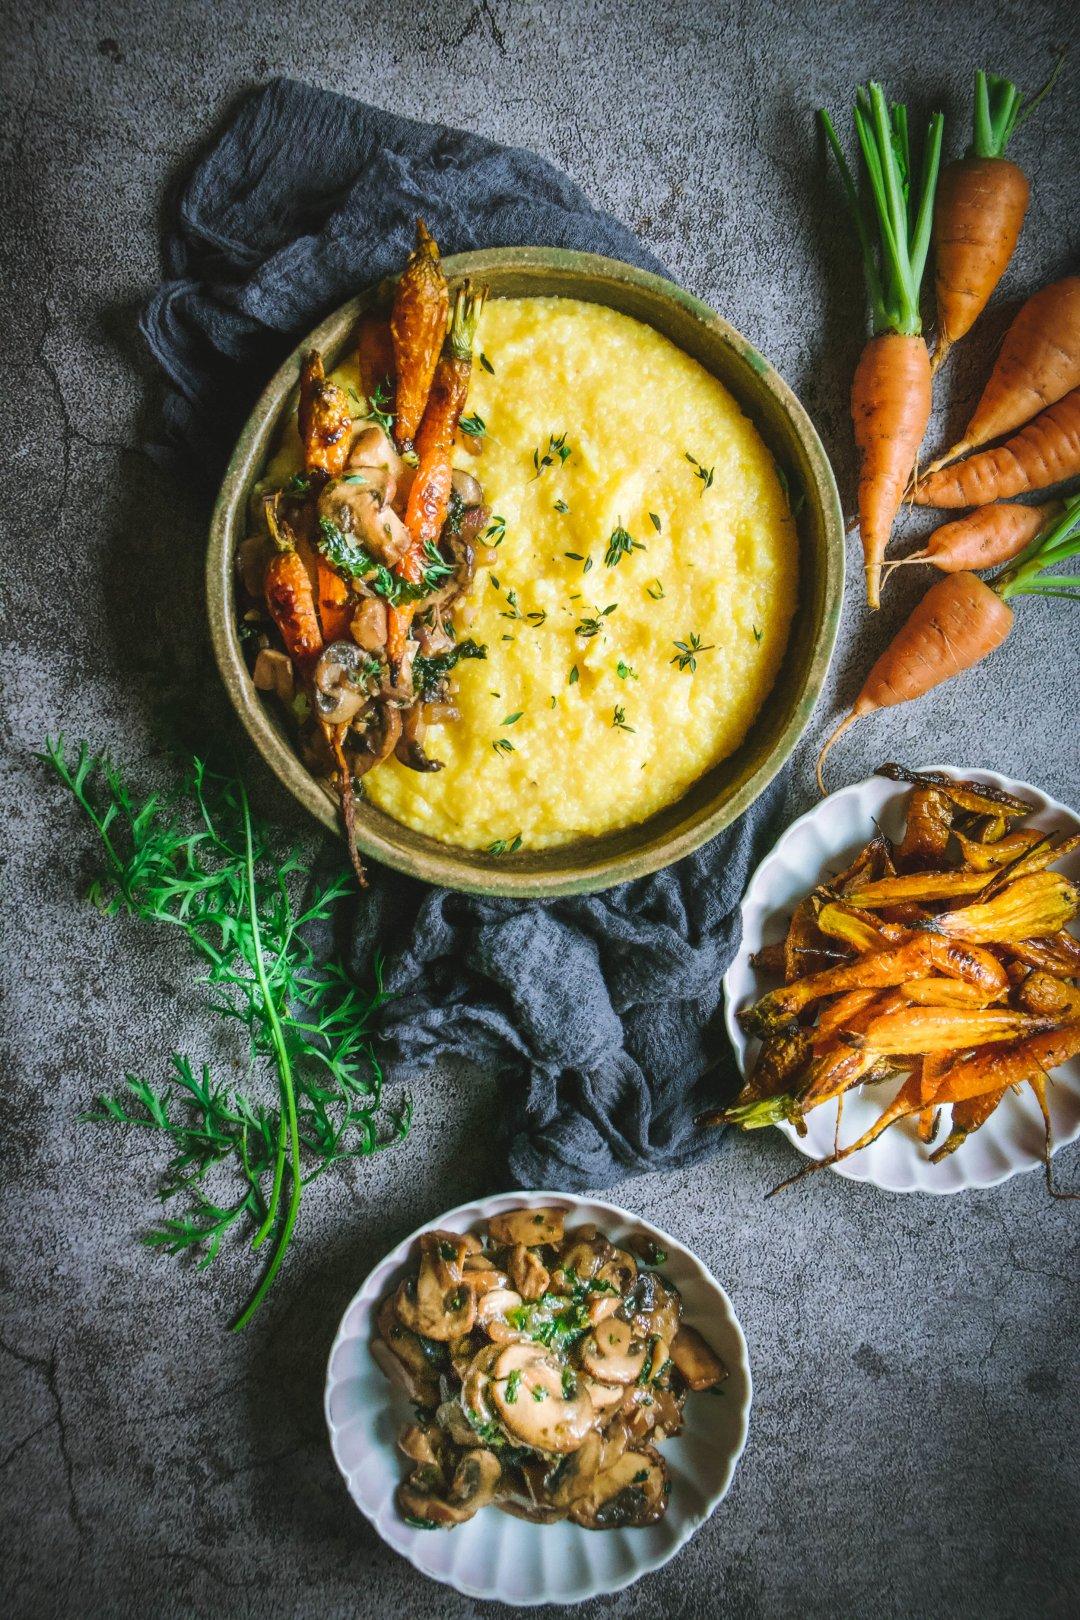 bowl of roasted carrots, roasted mushrooms and polenta